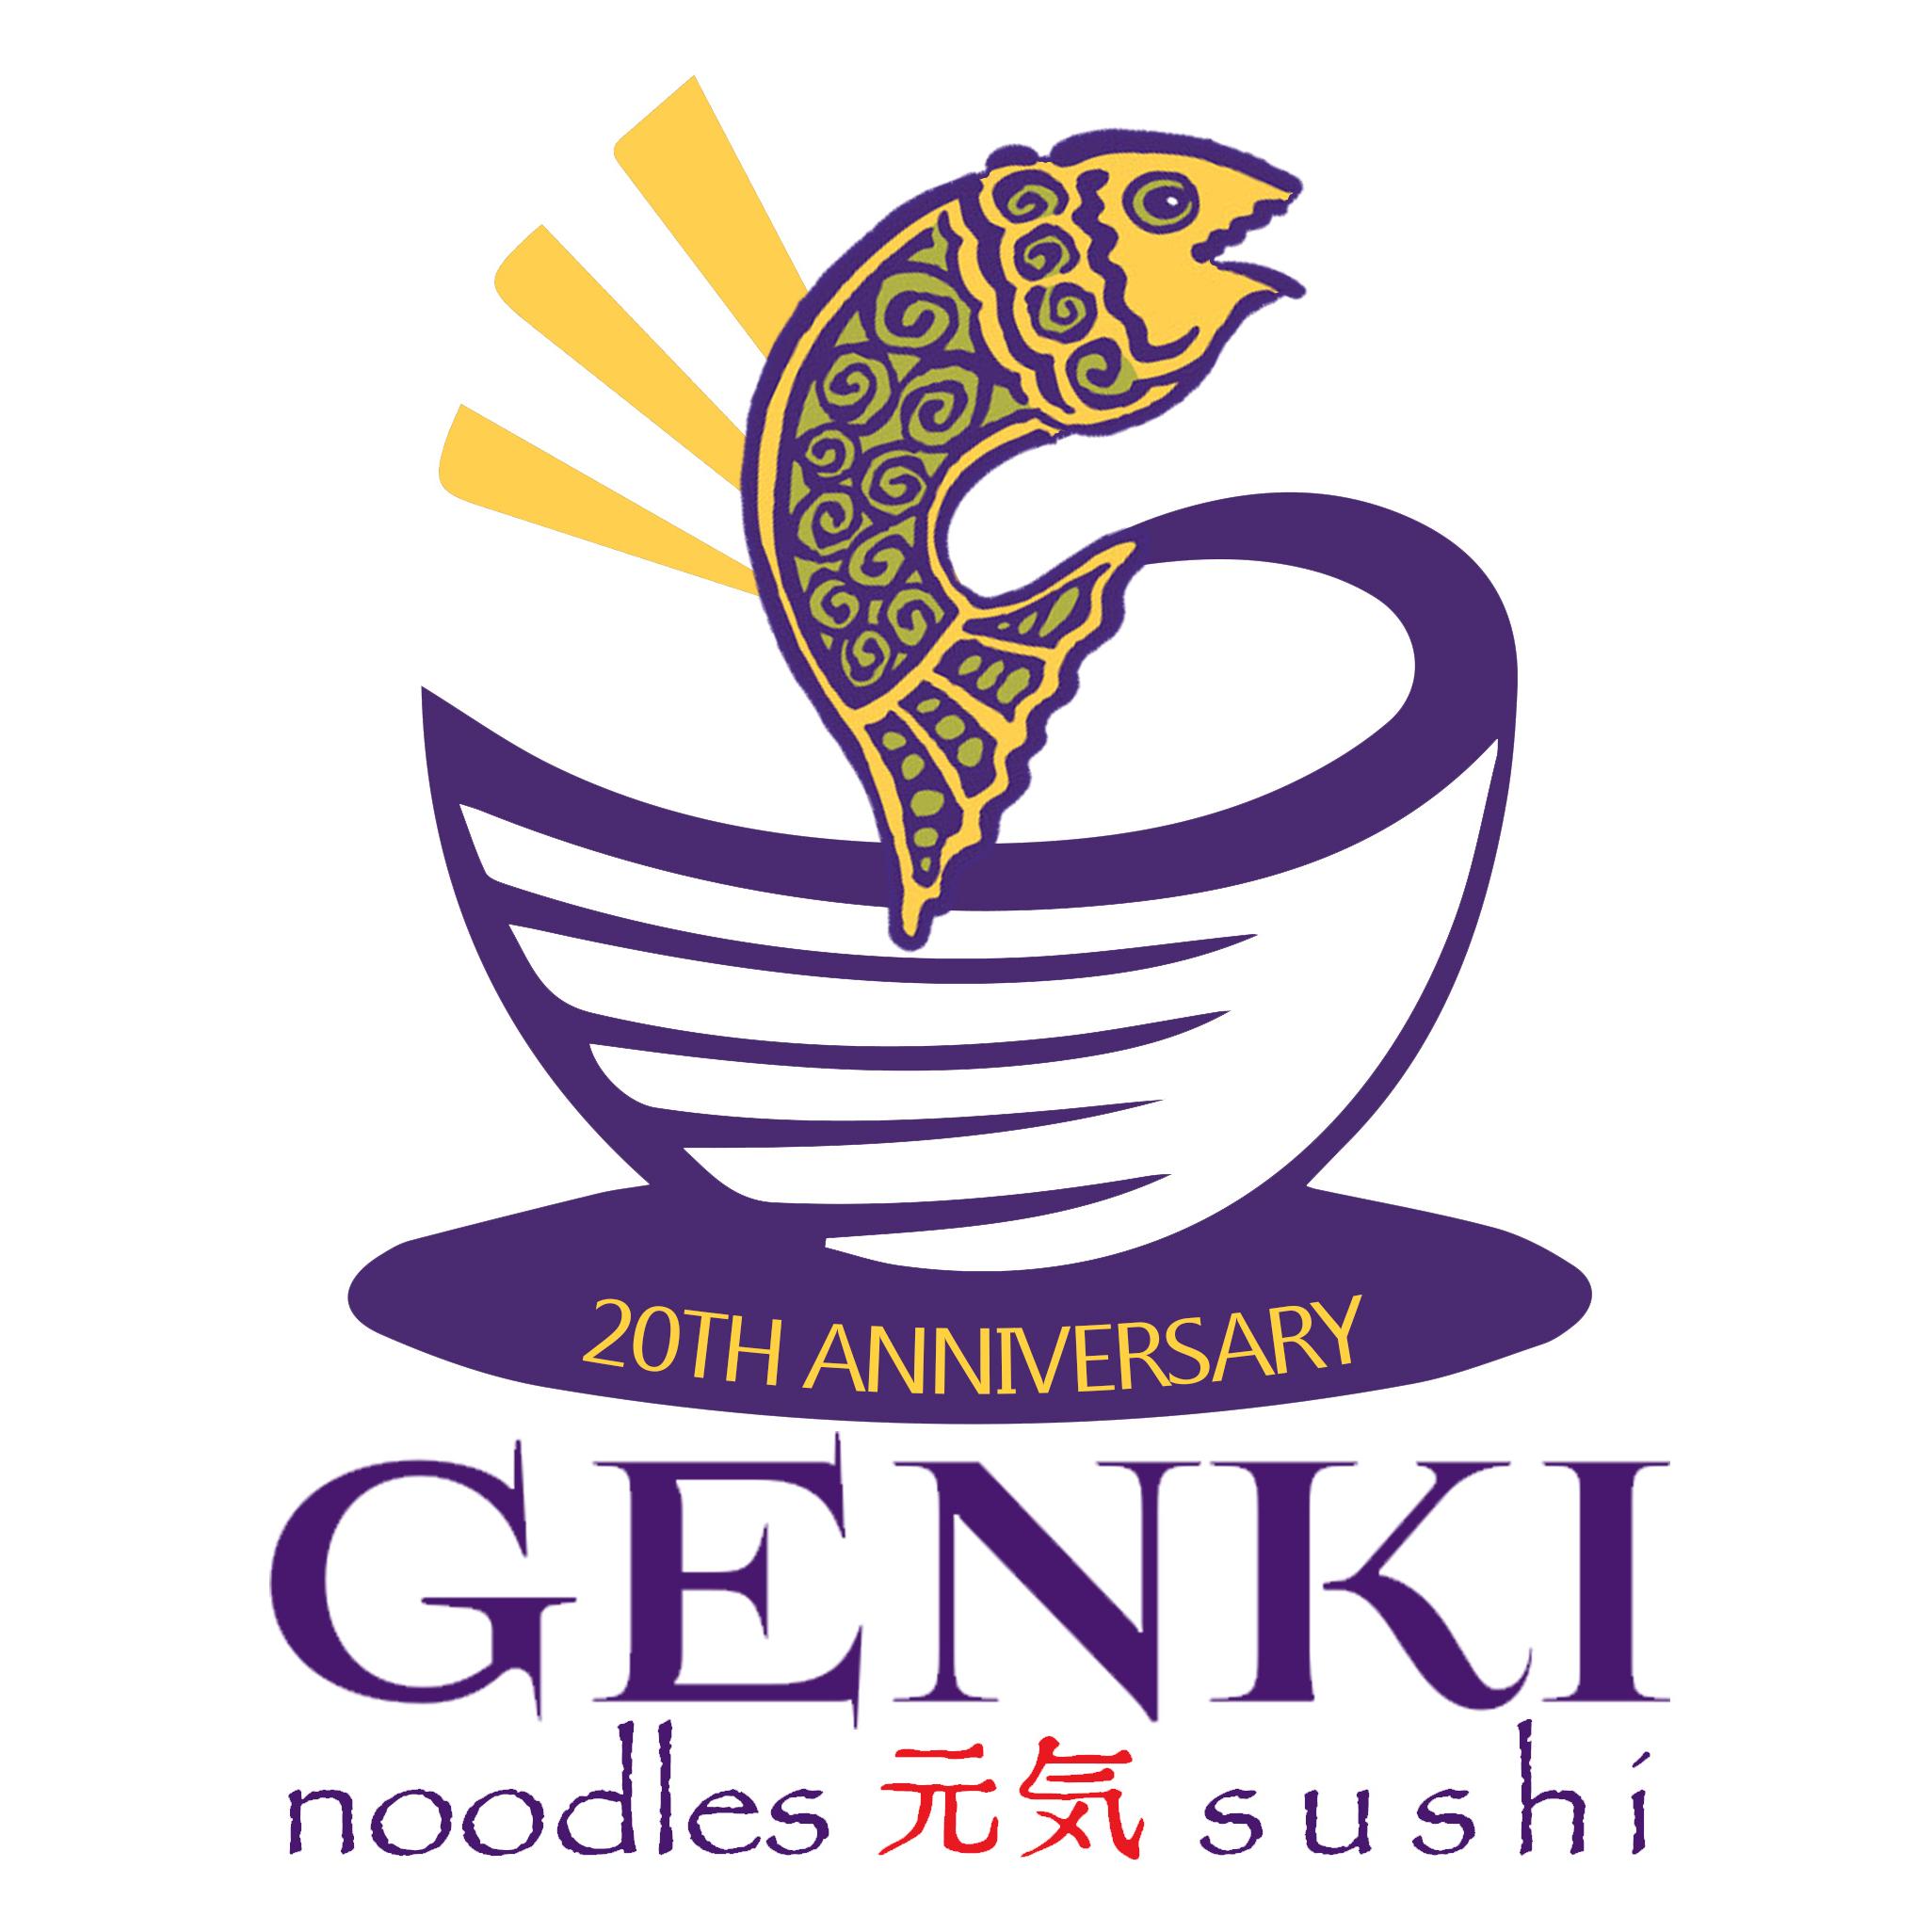 GENKI Noodles and Sushi - Buckhead - Atlanta, GA - Restaurants